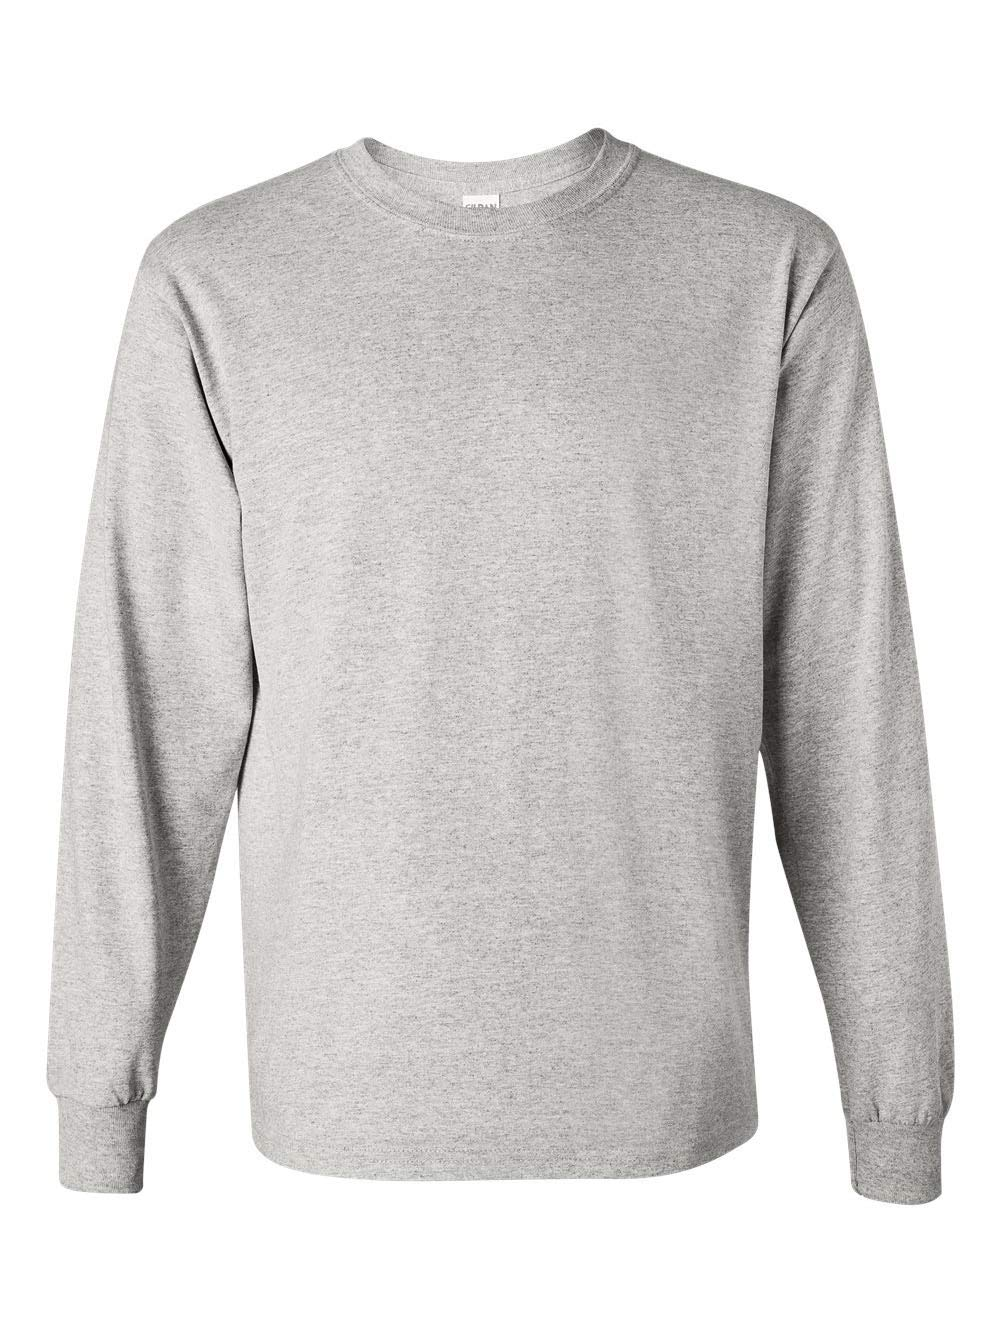 Gildan - Heavy Cotton Long Sleeve T-Shirt - 5400